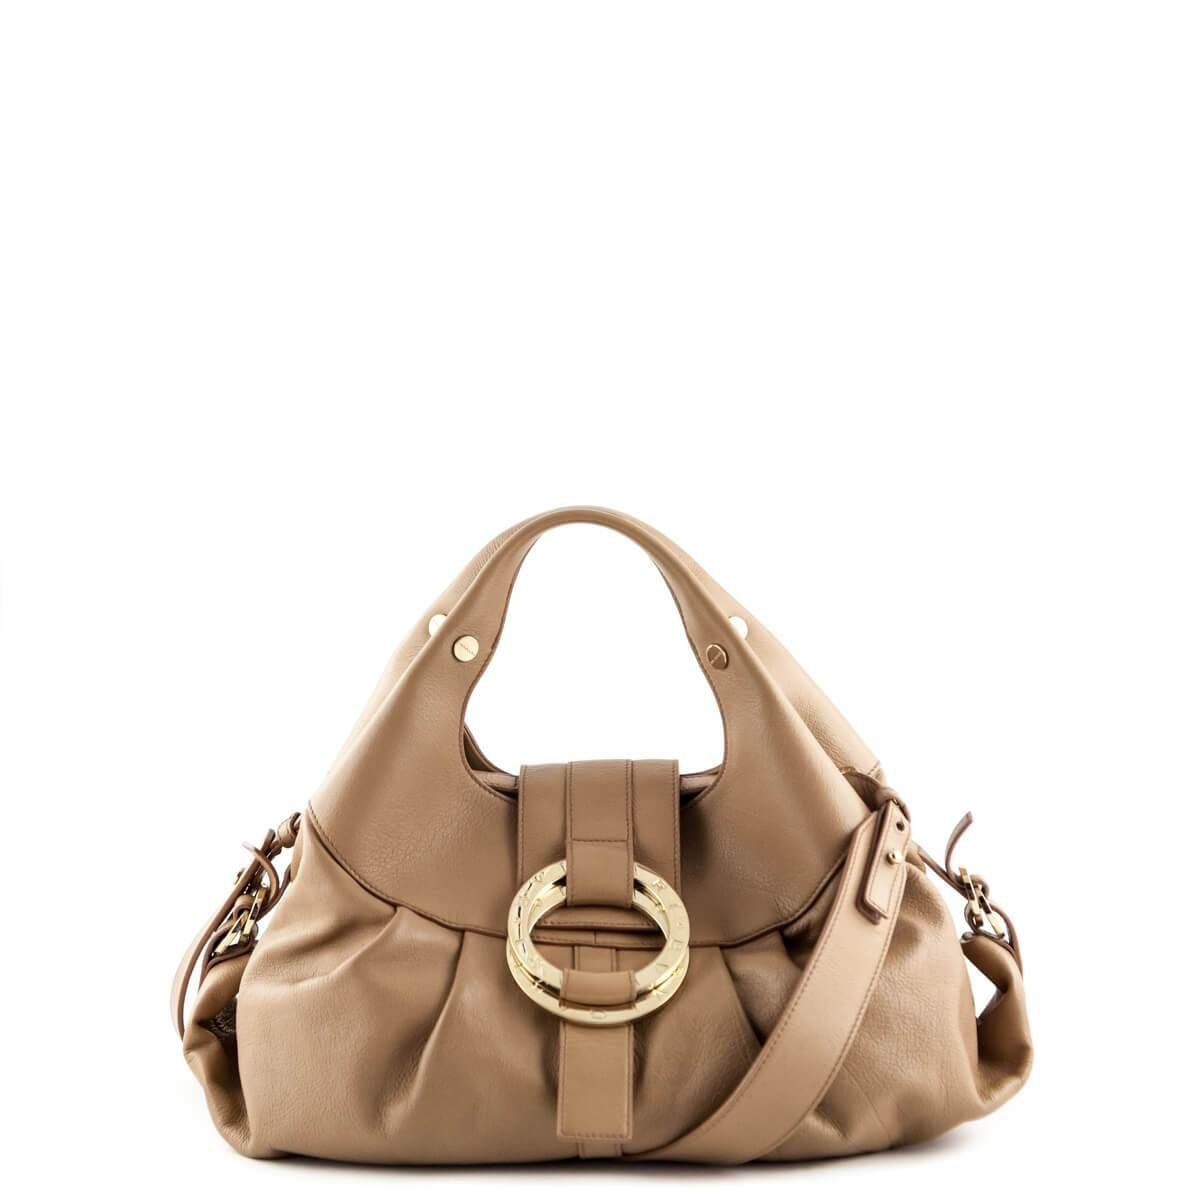 Bvlgari Beige Leather Small Chandra Top Handle Designer Pursesdesigner